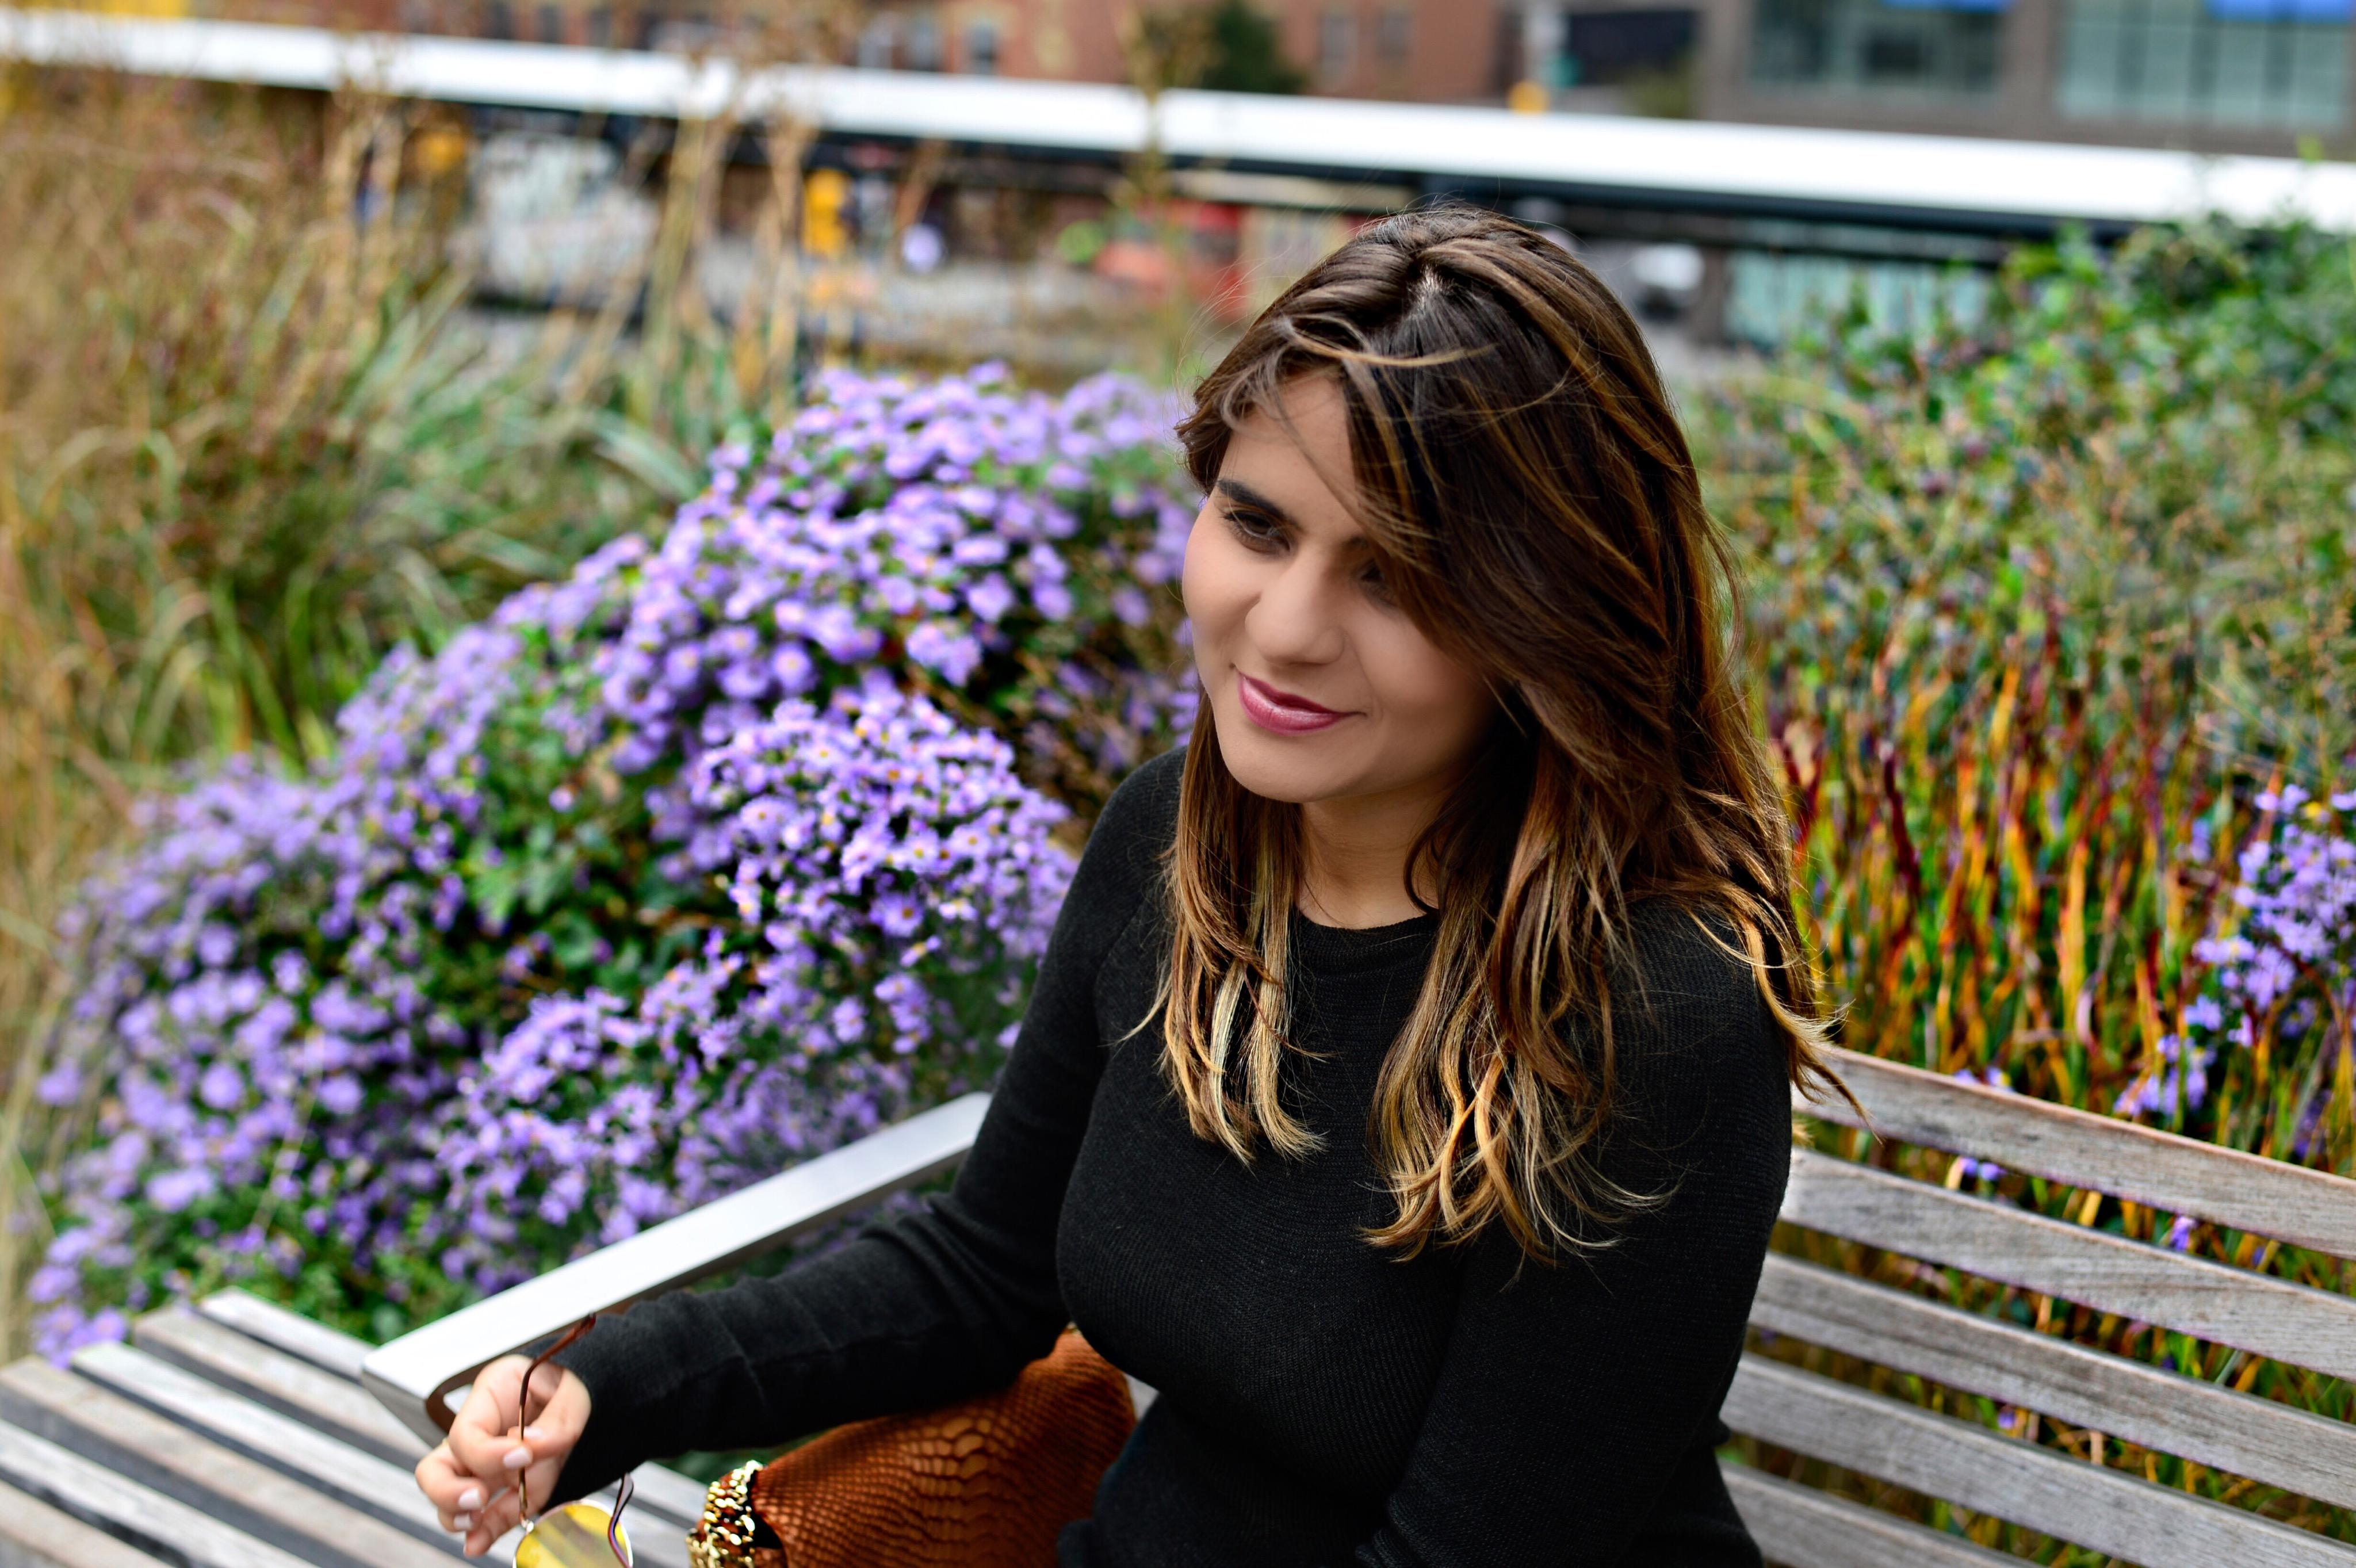 jersey-dress-gold-shoes-alley-girl-betul-yildiz-new-york-fashion-blogger-6